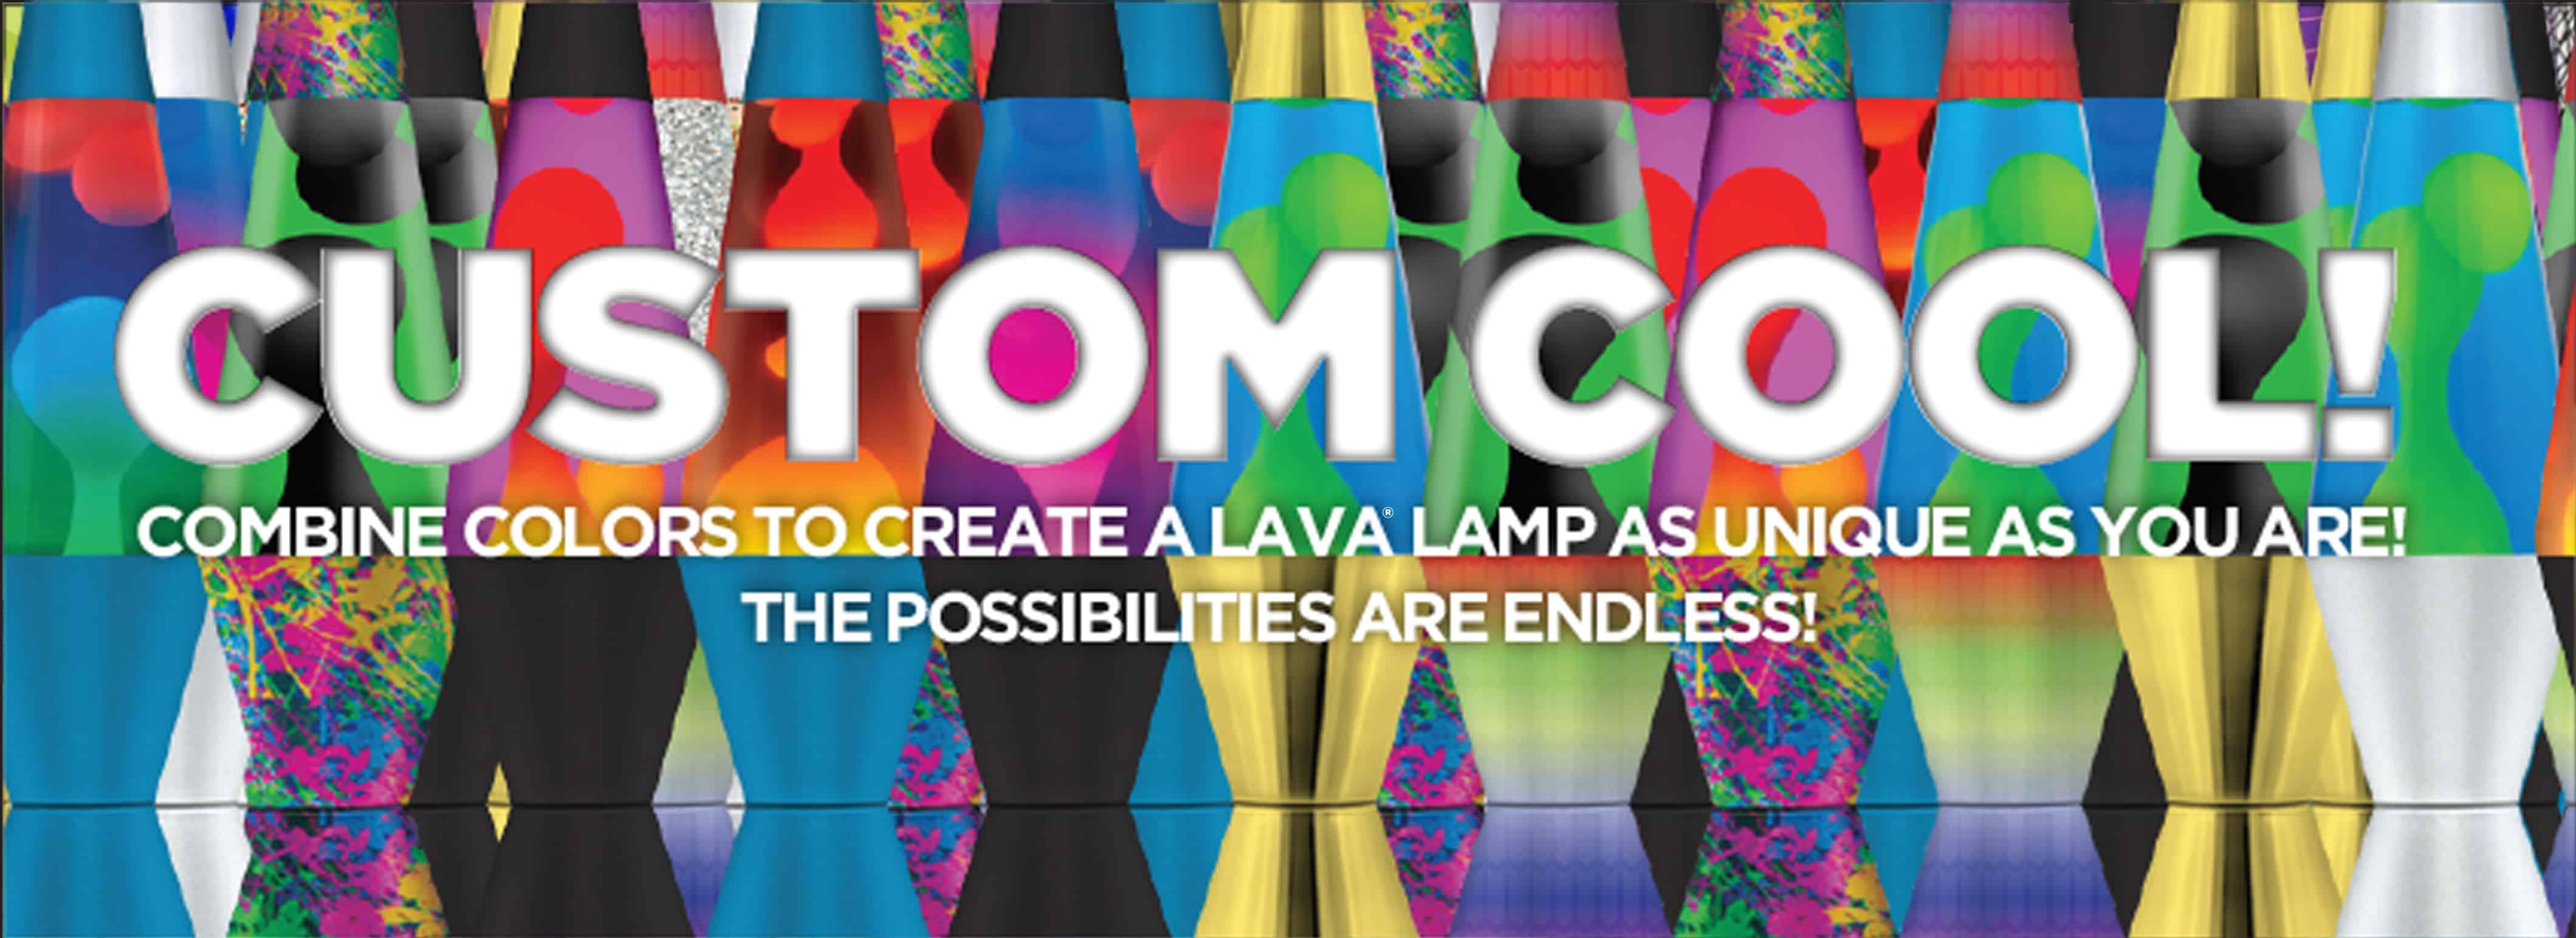 Cool Lava Lamps